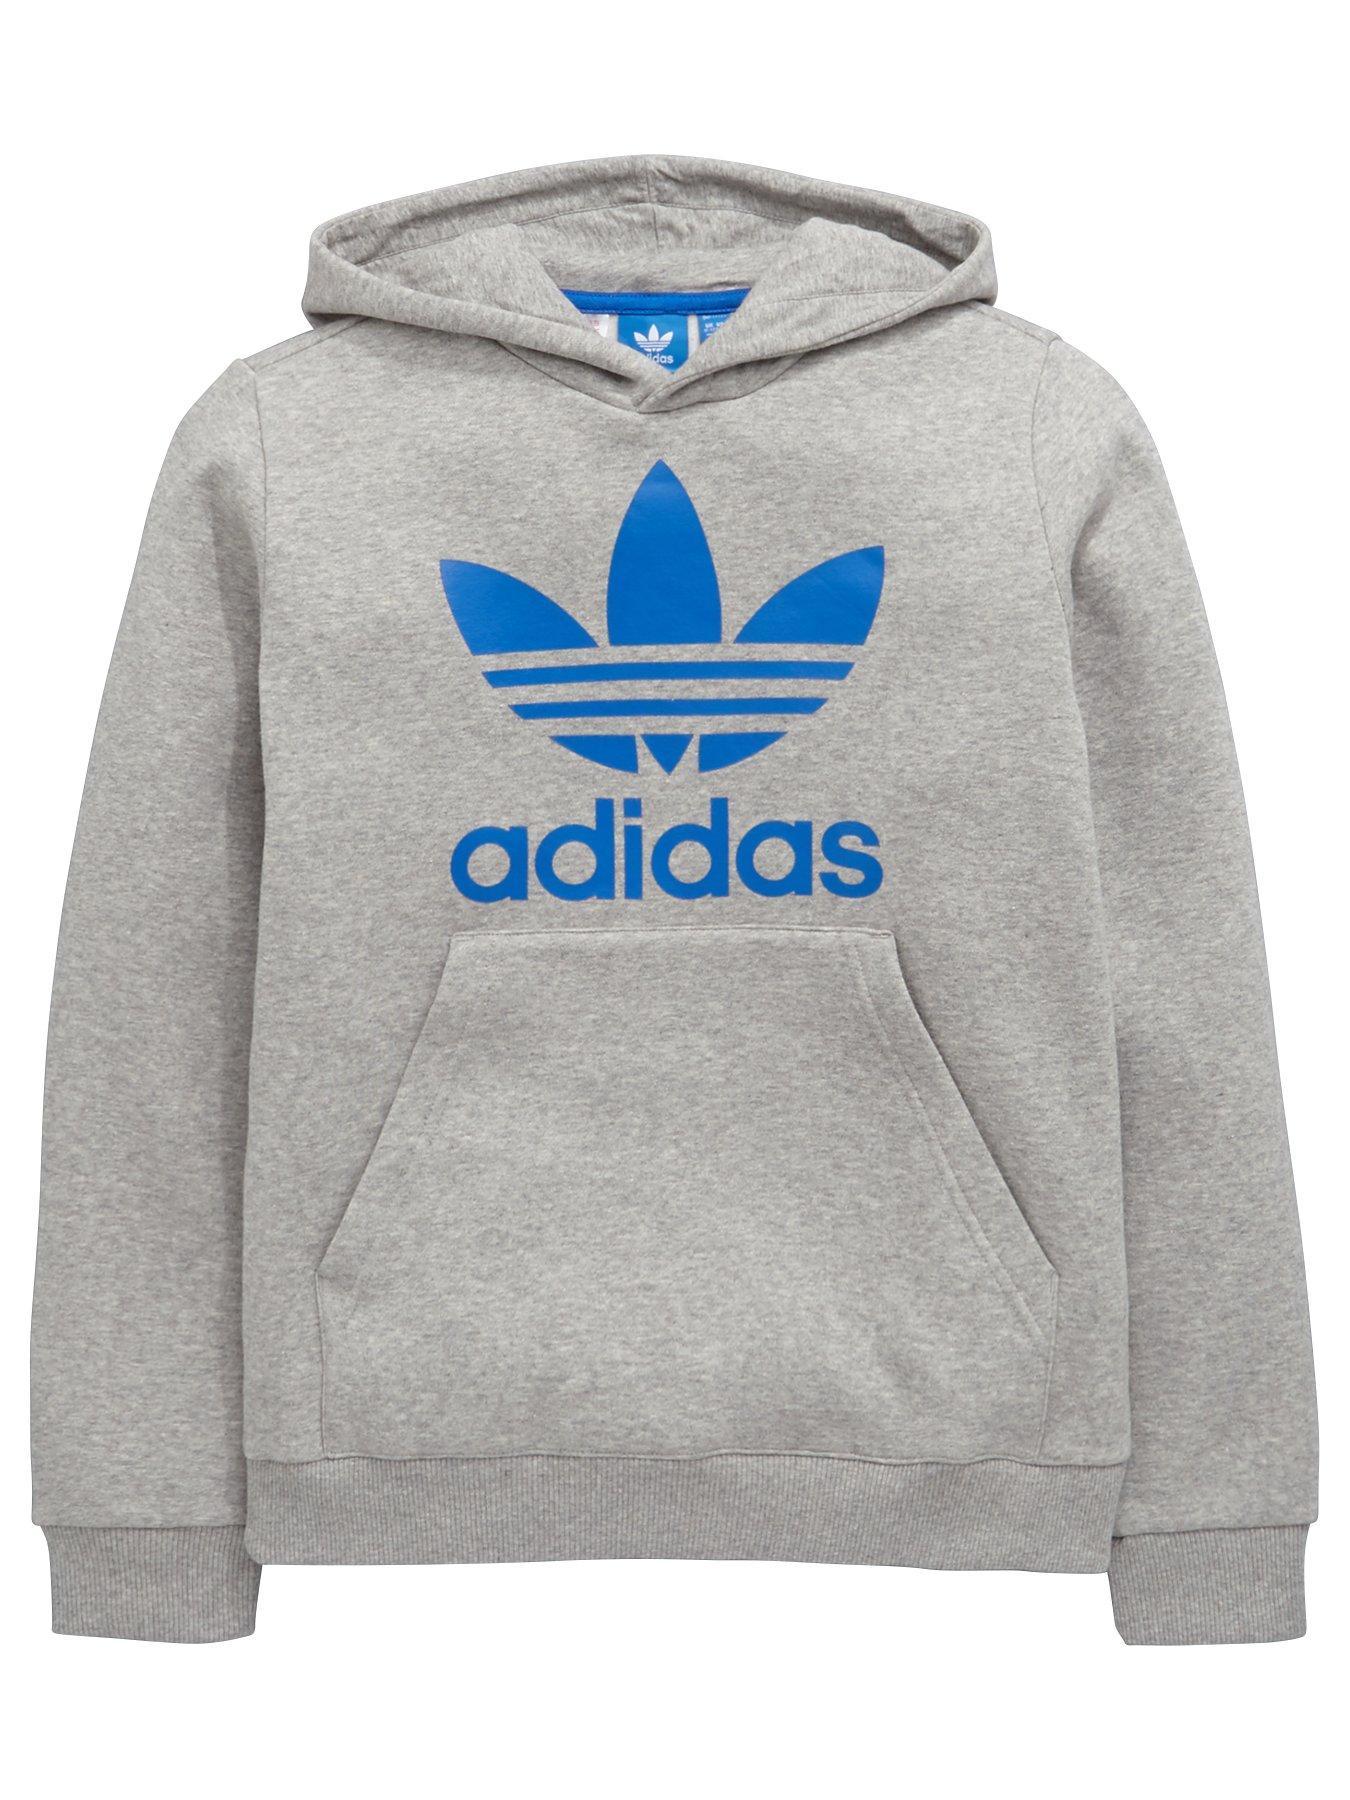 adidas hoodie grey and blue,adidas performance watches   OFF78% Free ... c6eba151ab